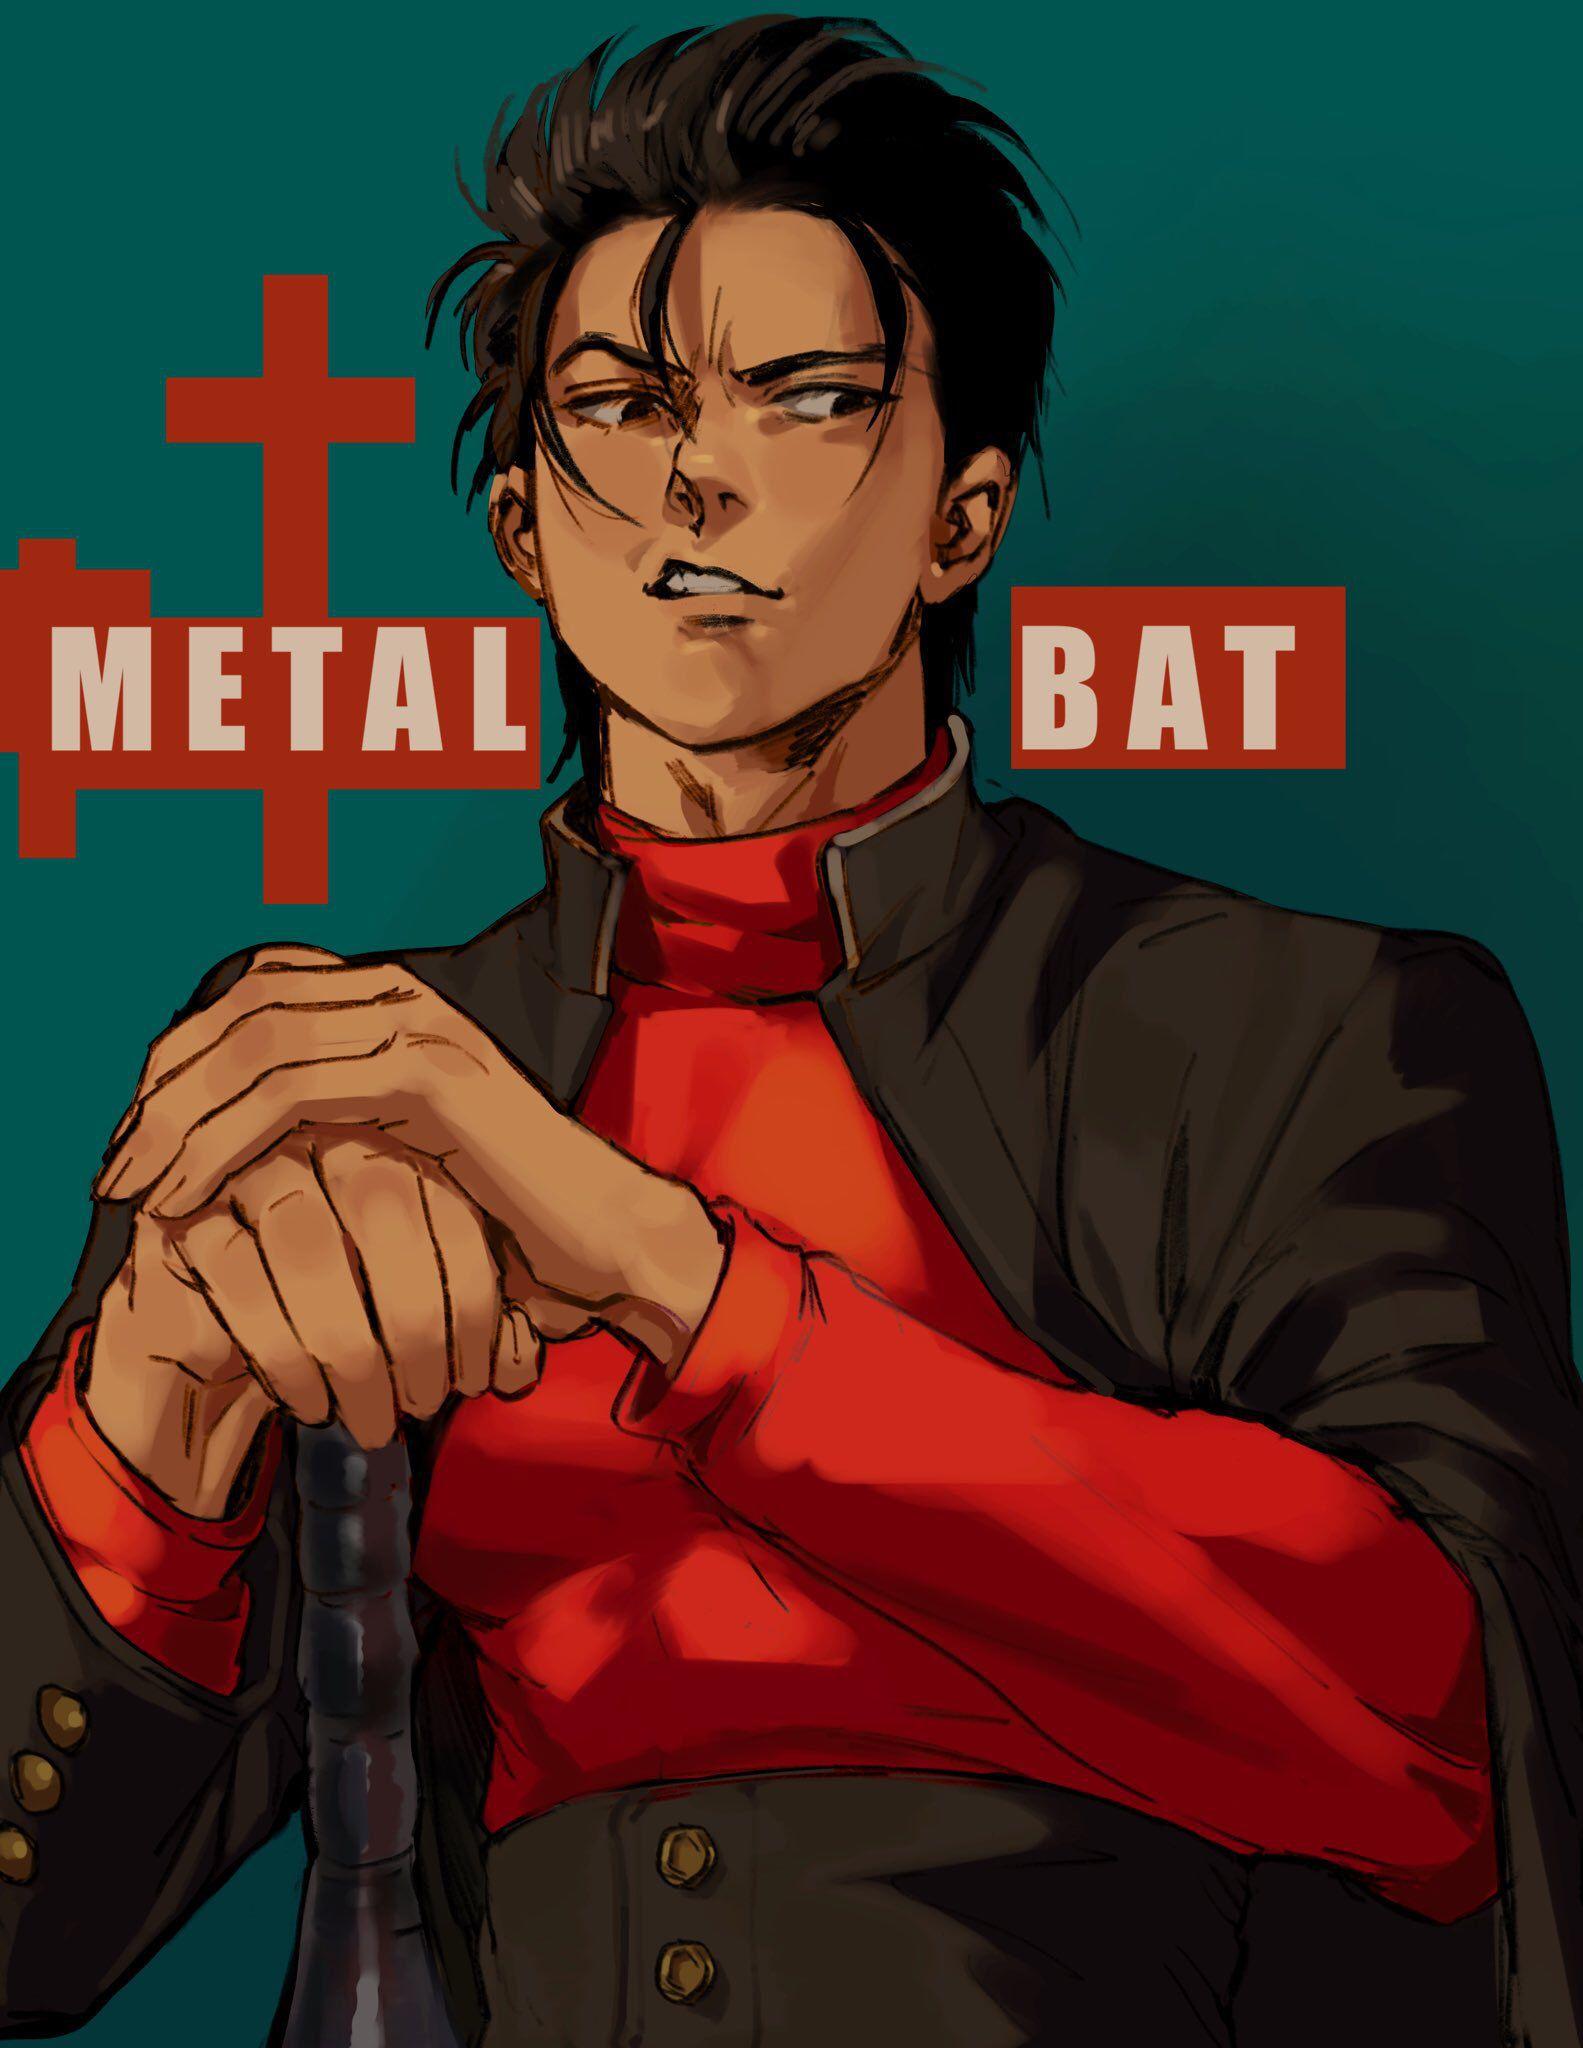 One punch man manga by Emilio Kreiss on Anime/Art in 2020